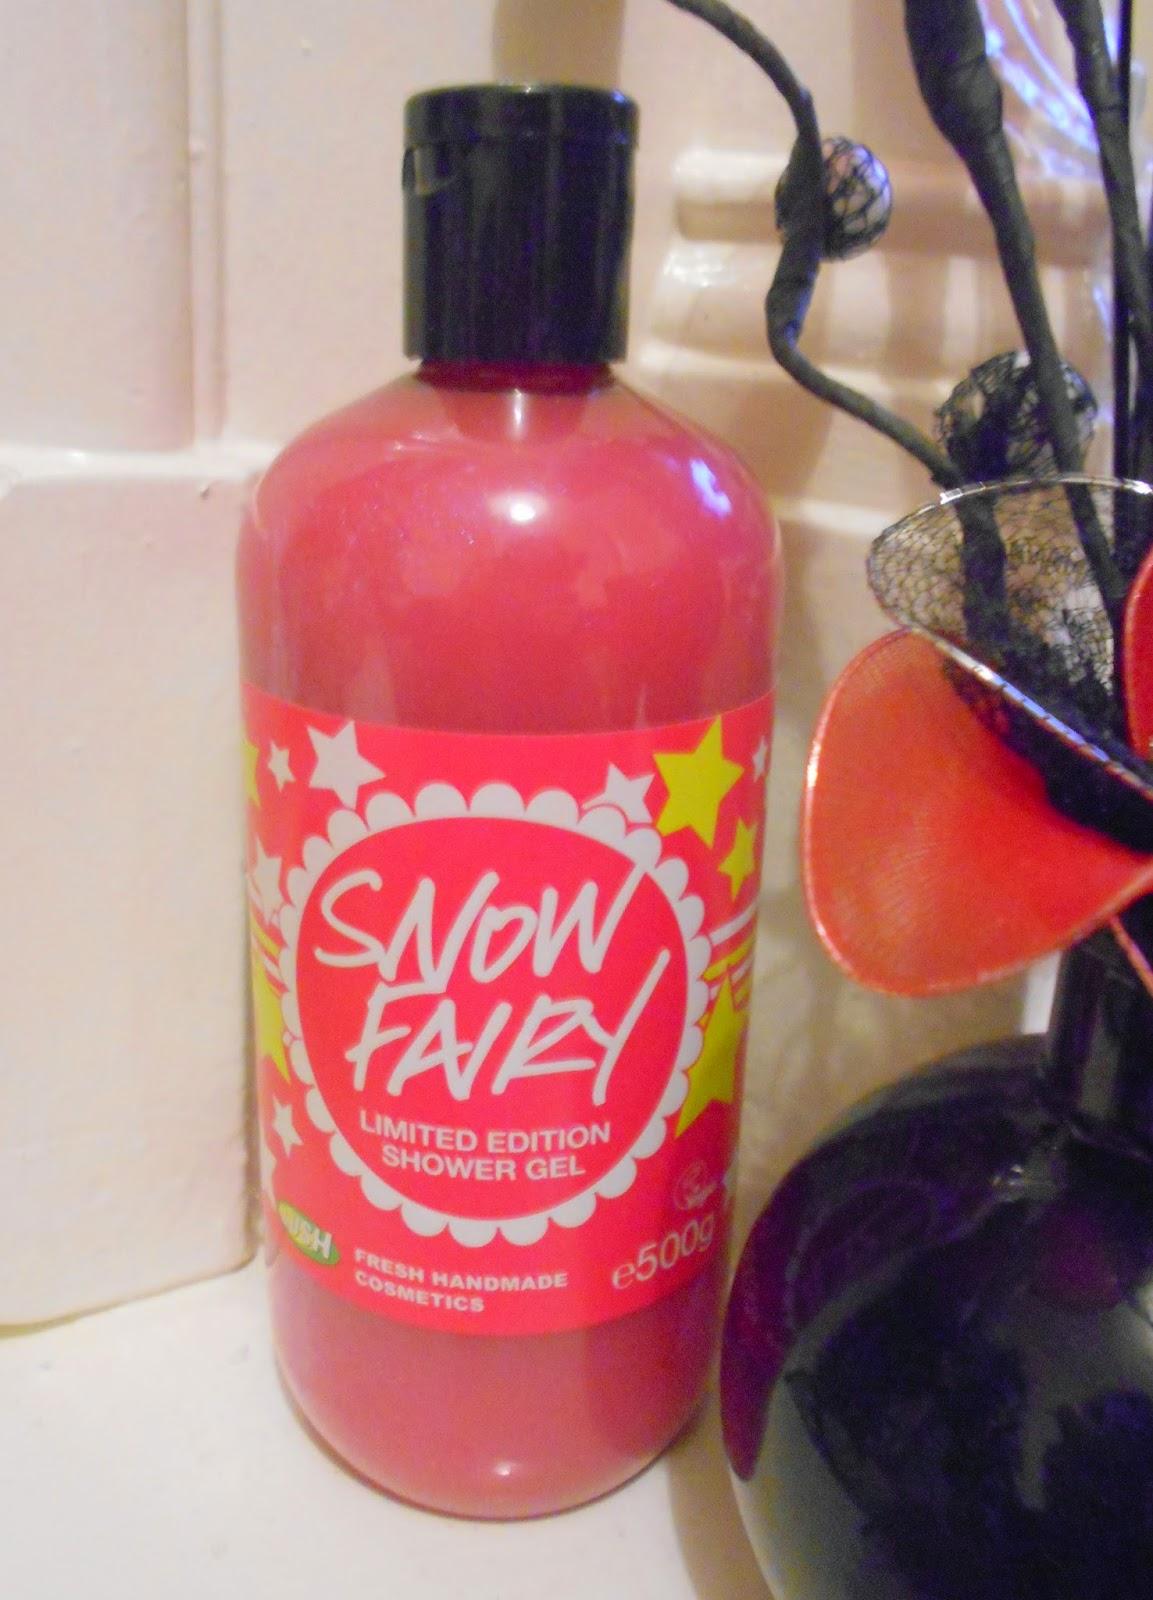 Lush - Snow Fairy Limited Edition Shower Gel